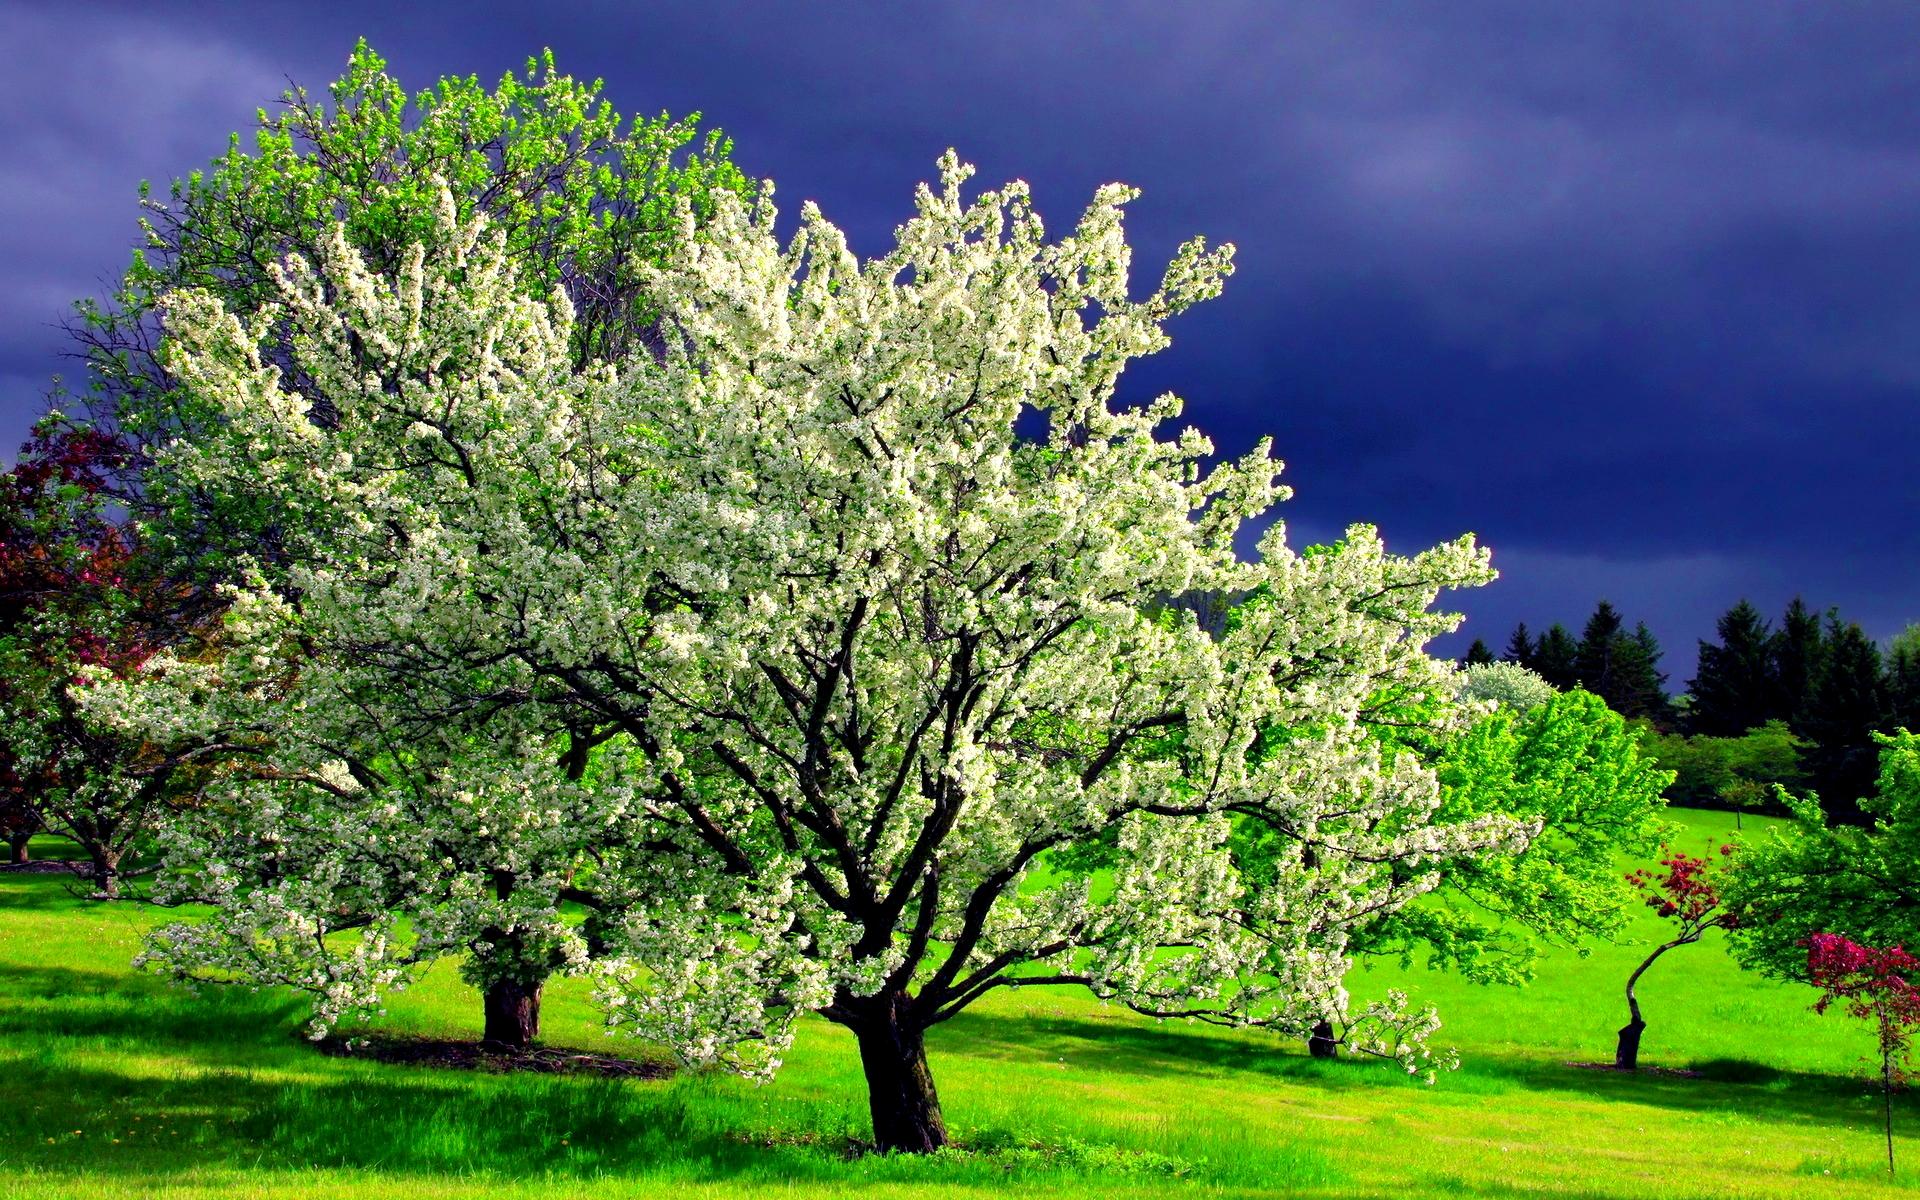 dream-spring-2012-spring-tree_1920x1200_96932